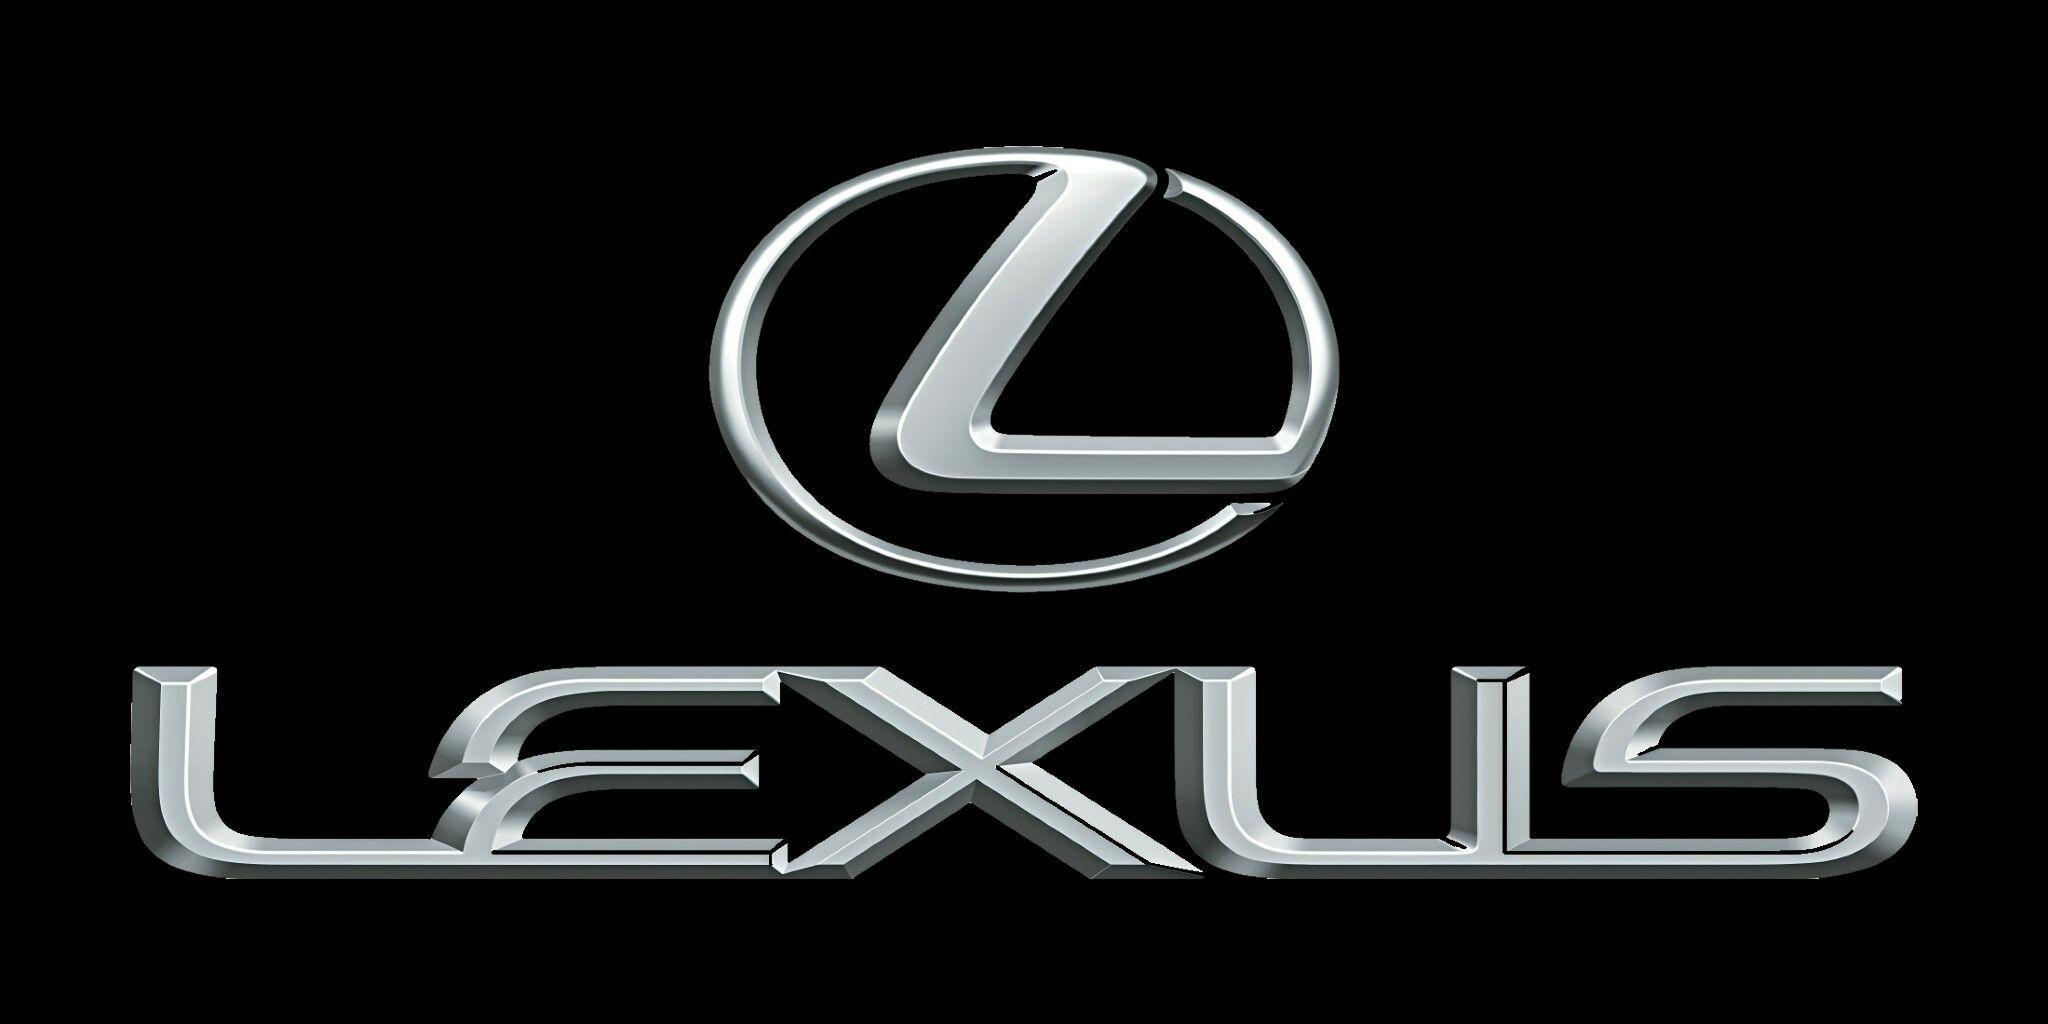 Lexus Logo Wallpapers Lexus Cars Toyota Japanese Cars